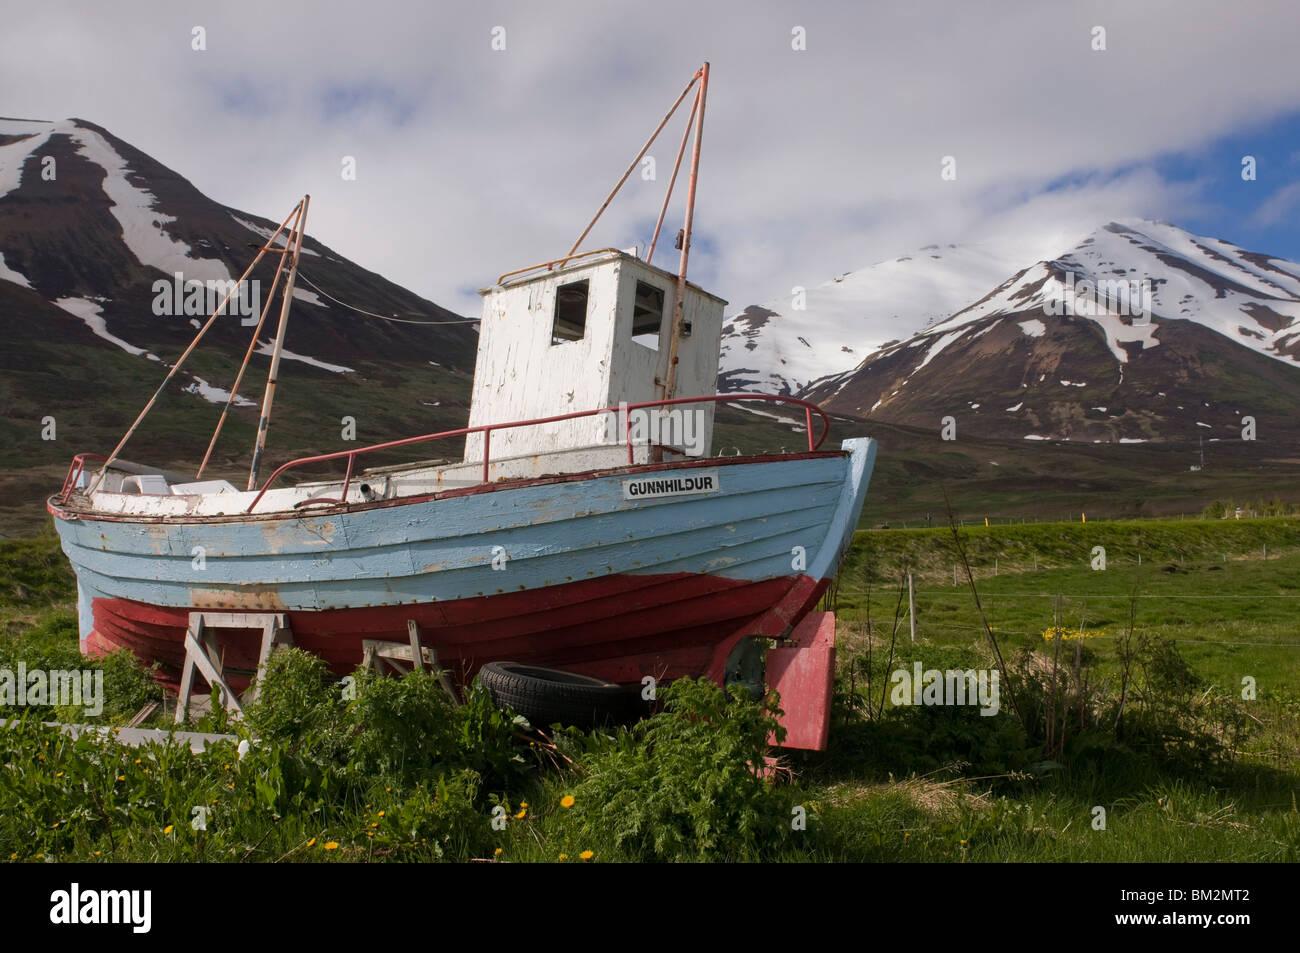 Fishing boat on land, Eyjafjordur, Iceland, Polar Regions - Stock Image